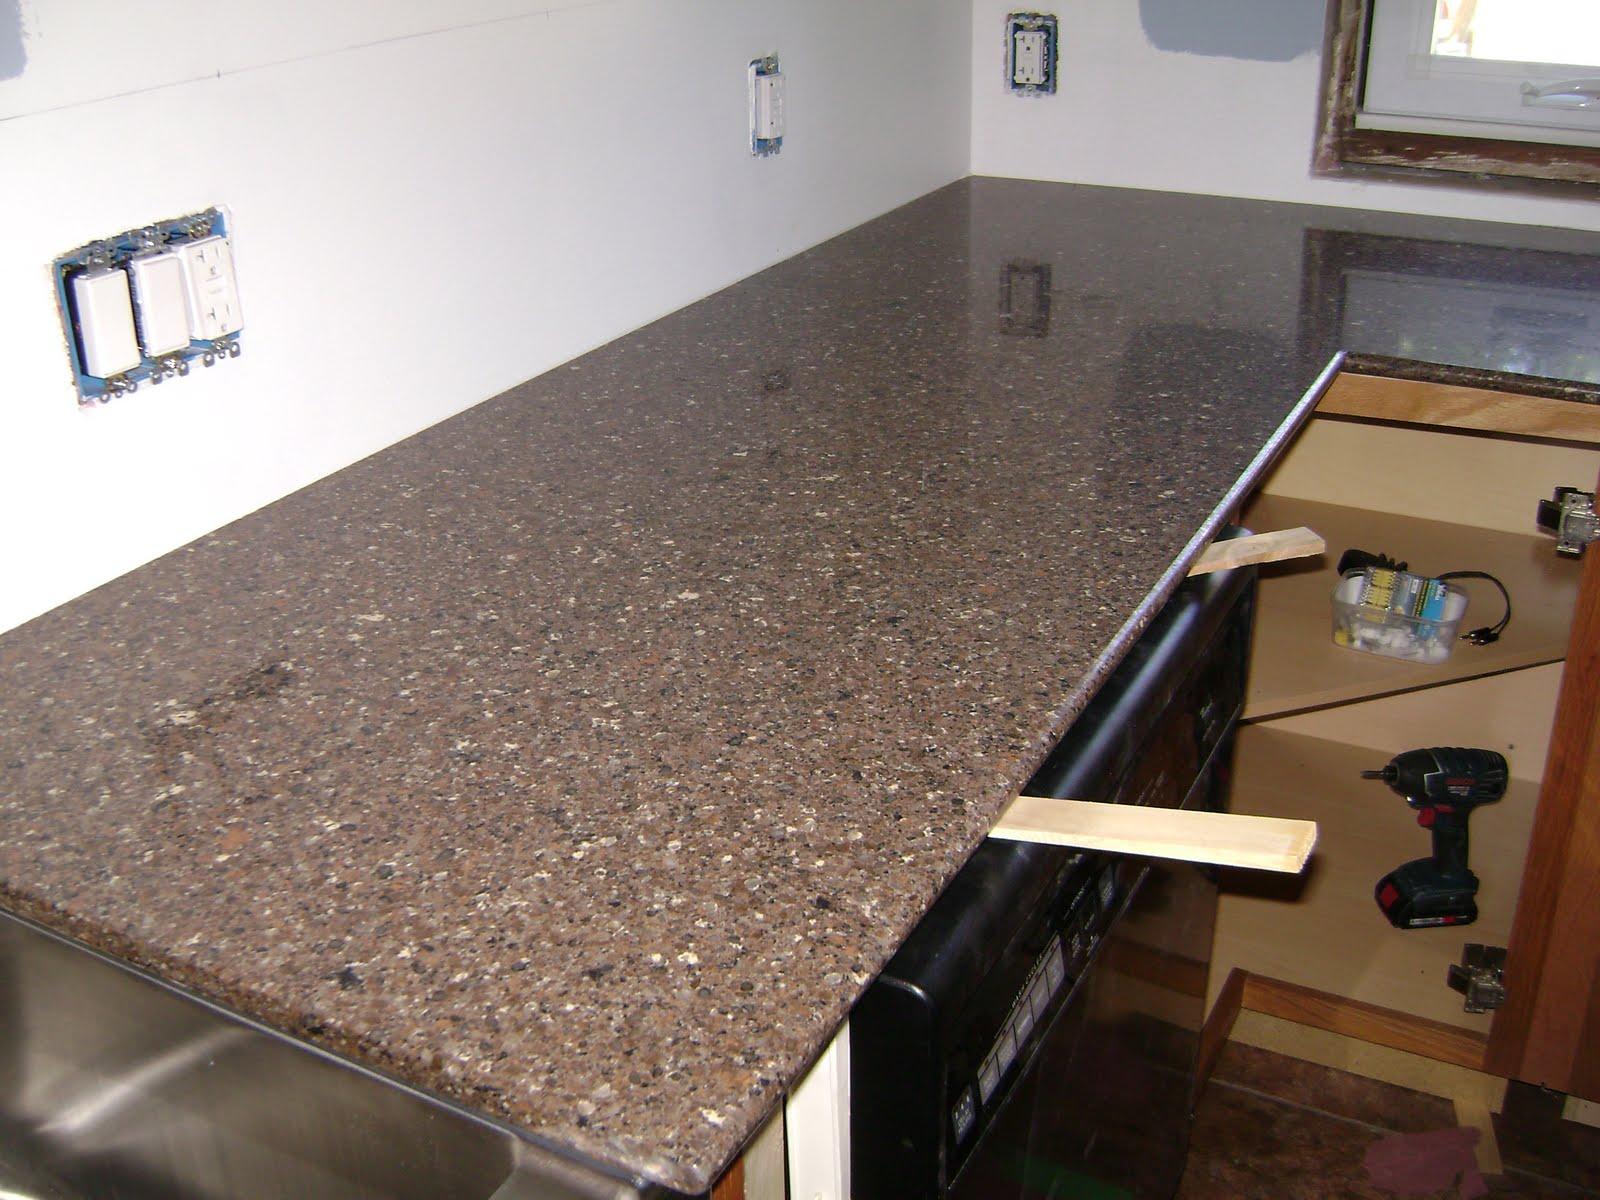 Updating: Countertops installed - Silestone, Sierra Madre